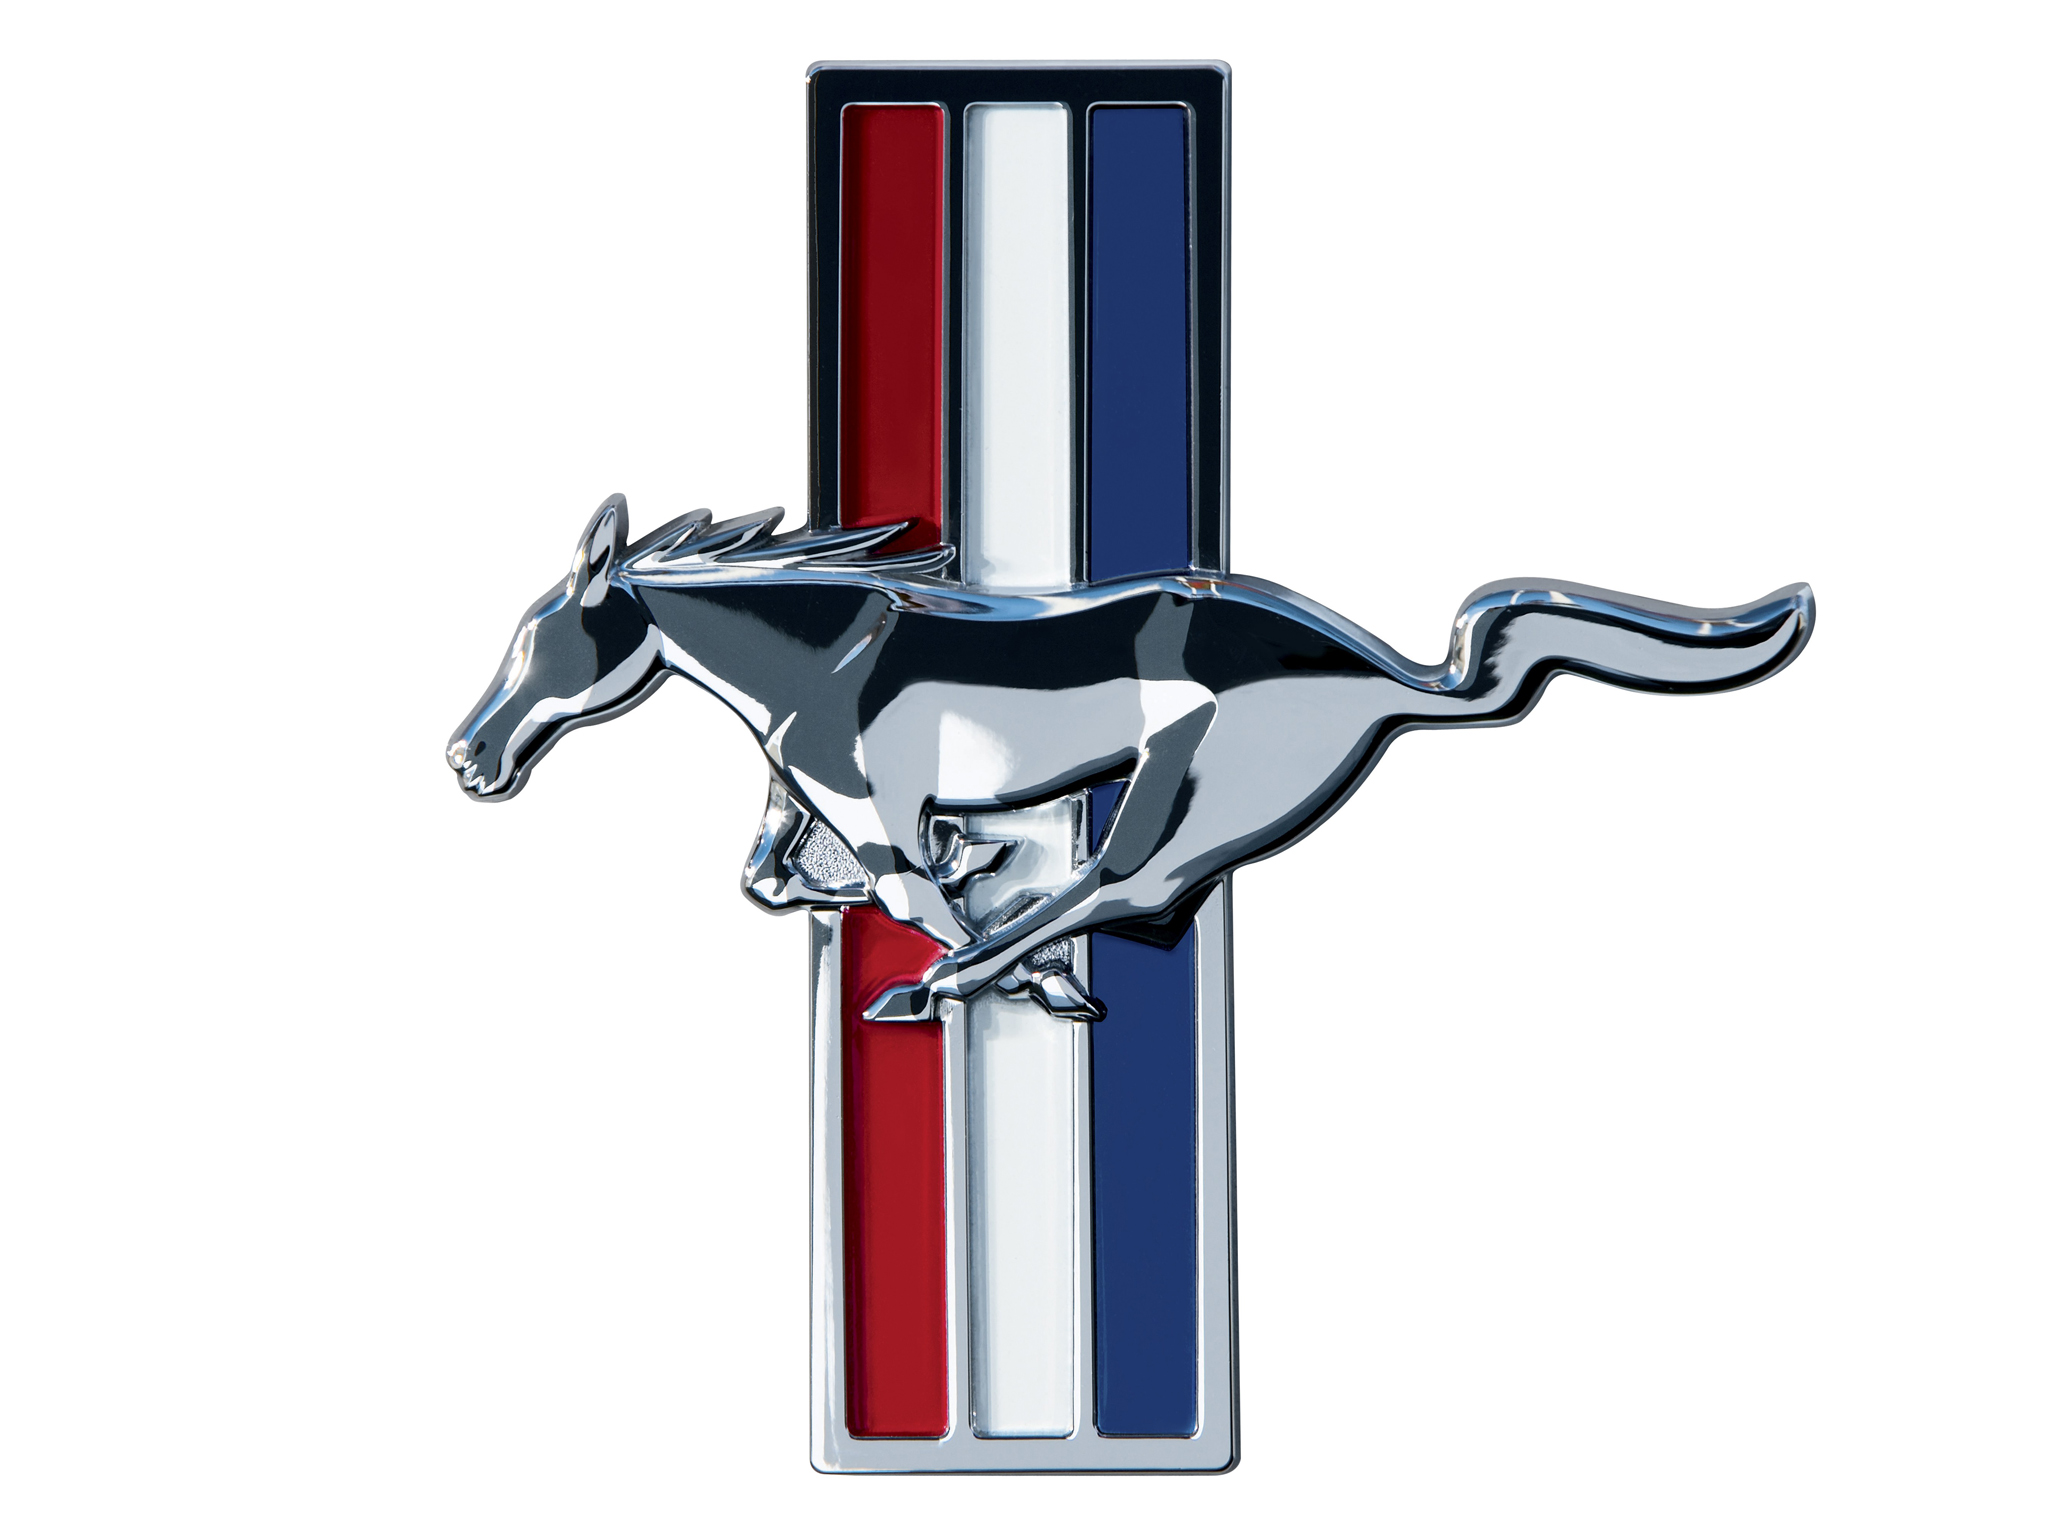 Vehicles   Ford Mustang Ford Mustang Logo Wallpaper 2048x1536